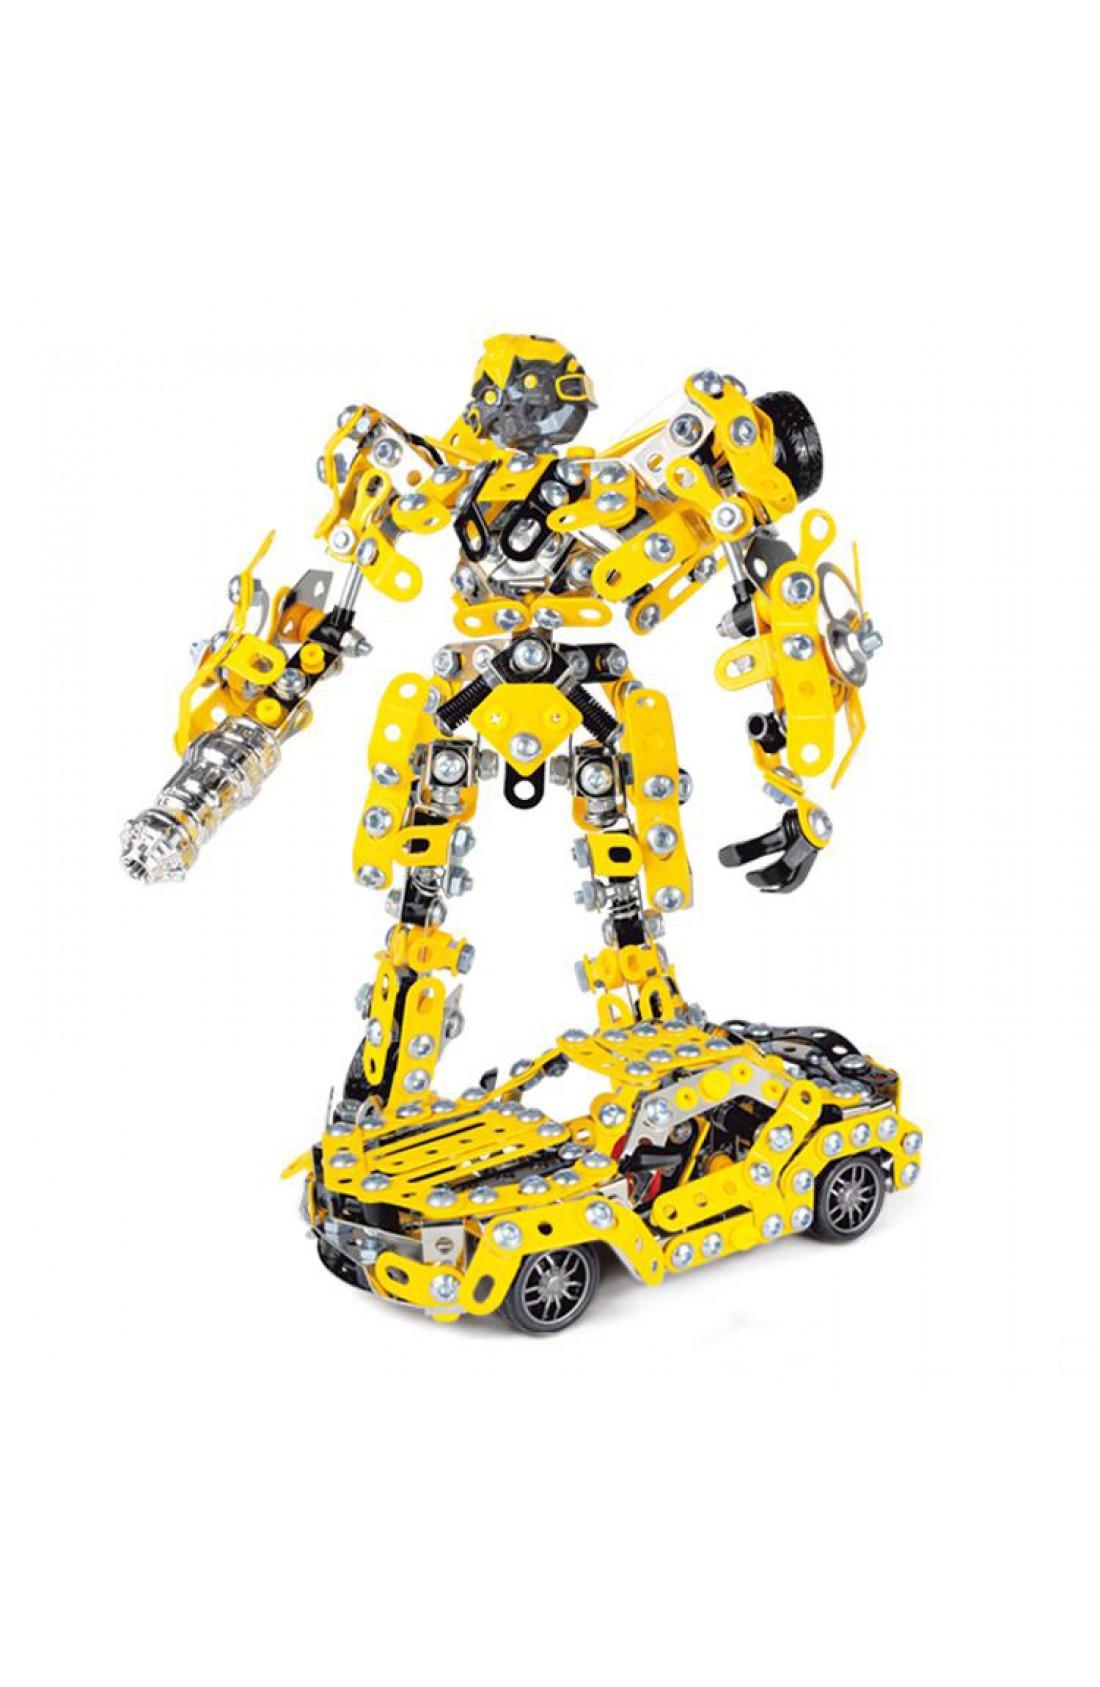 Iron Commander DIY Assembled Deform Robot Car Model Metal Blocks set Gifts